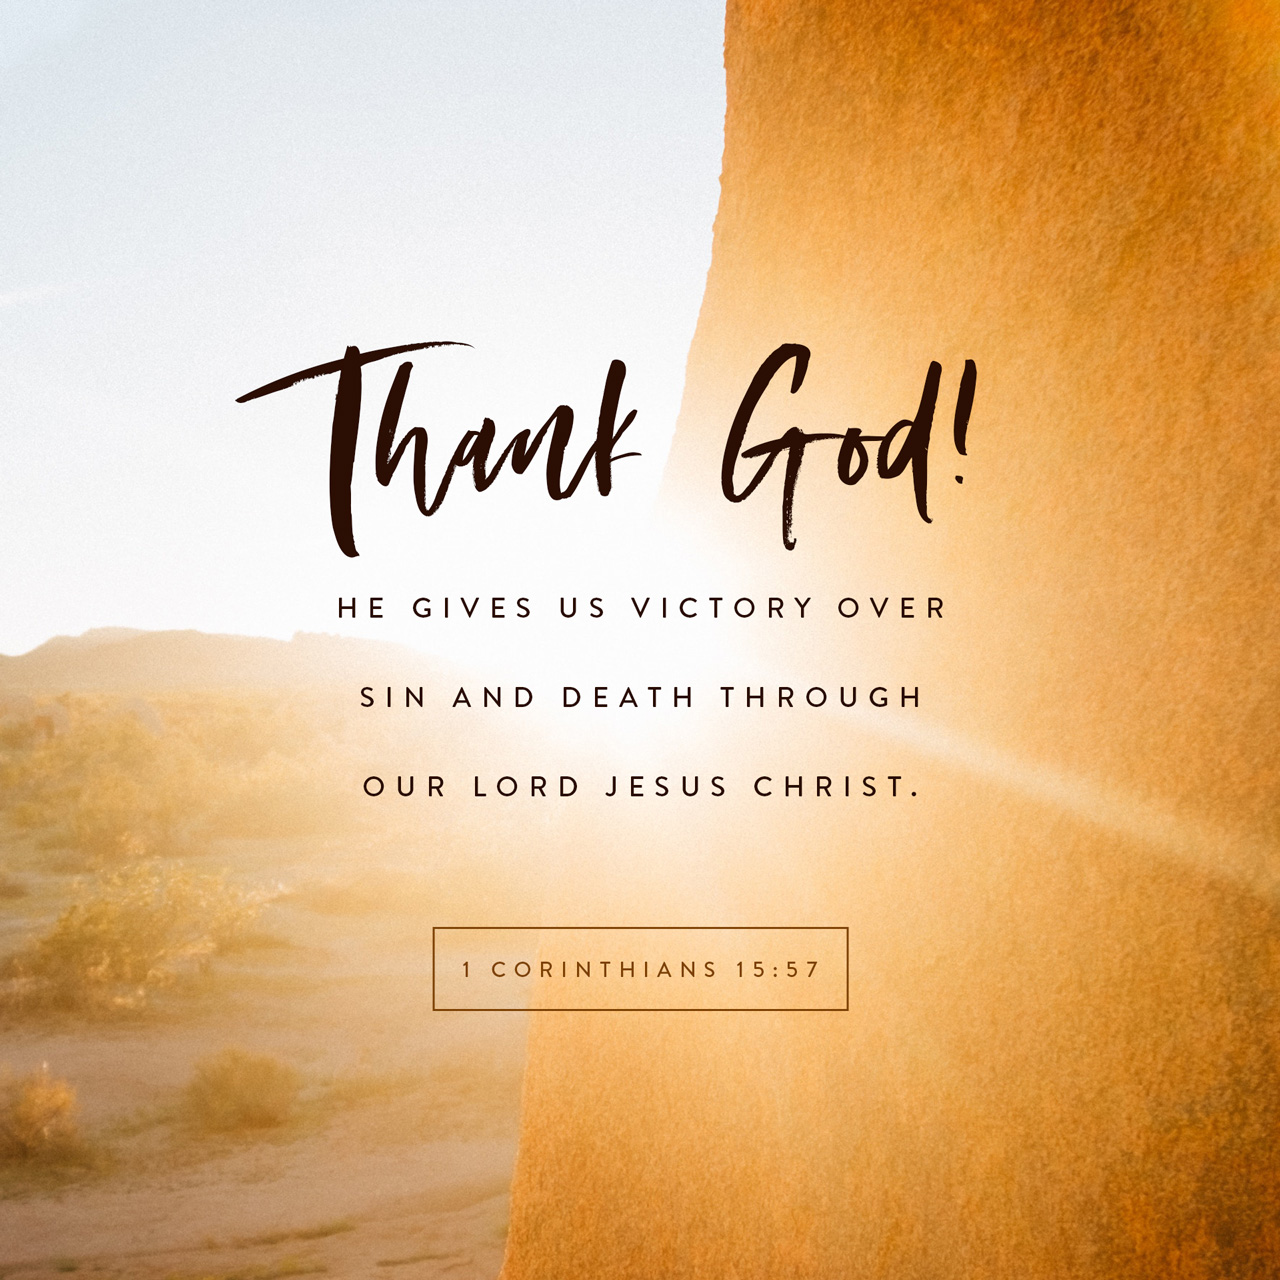 Verse Image - 1 Corinthians 15:57